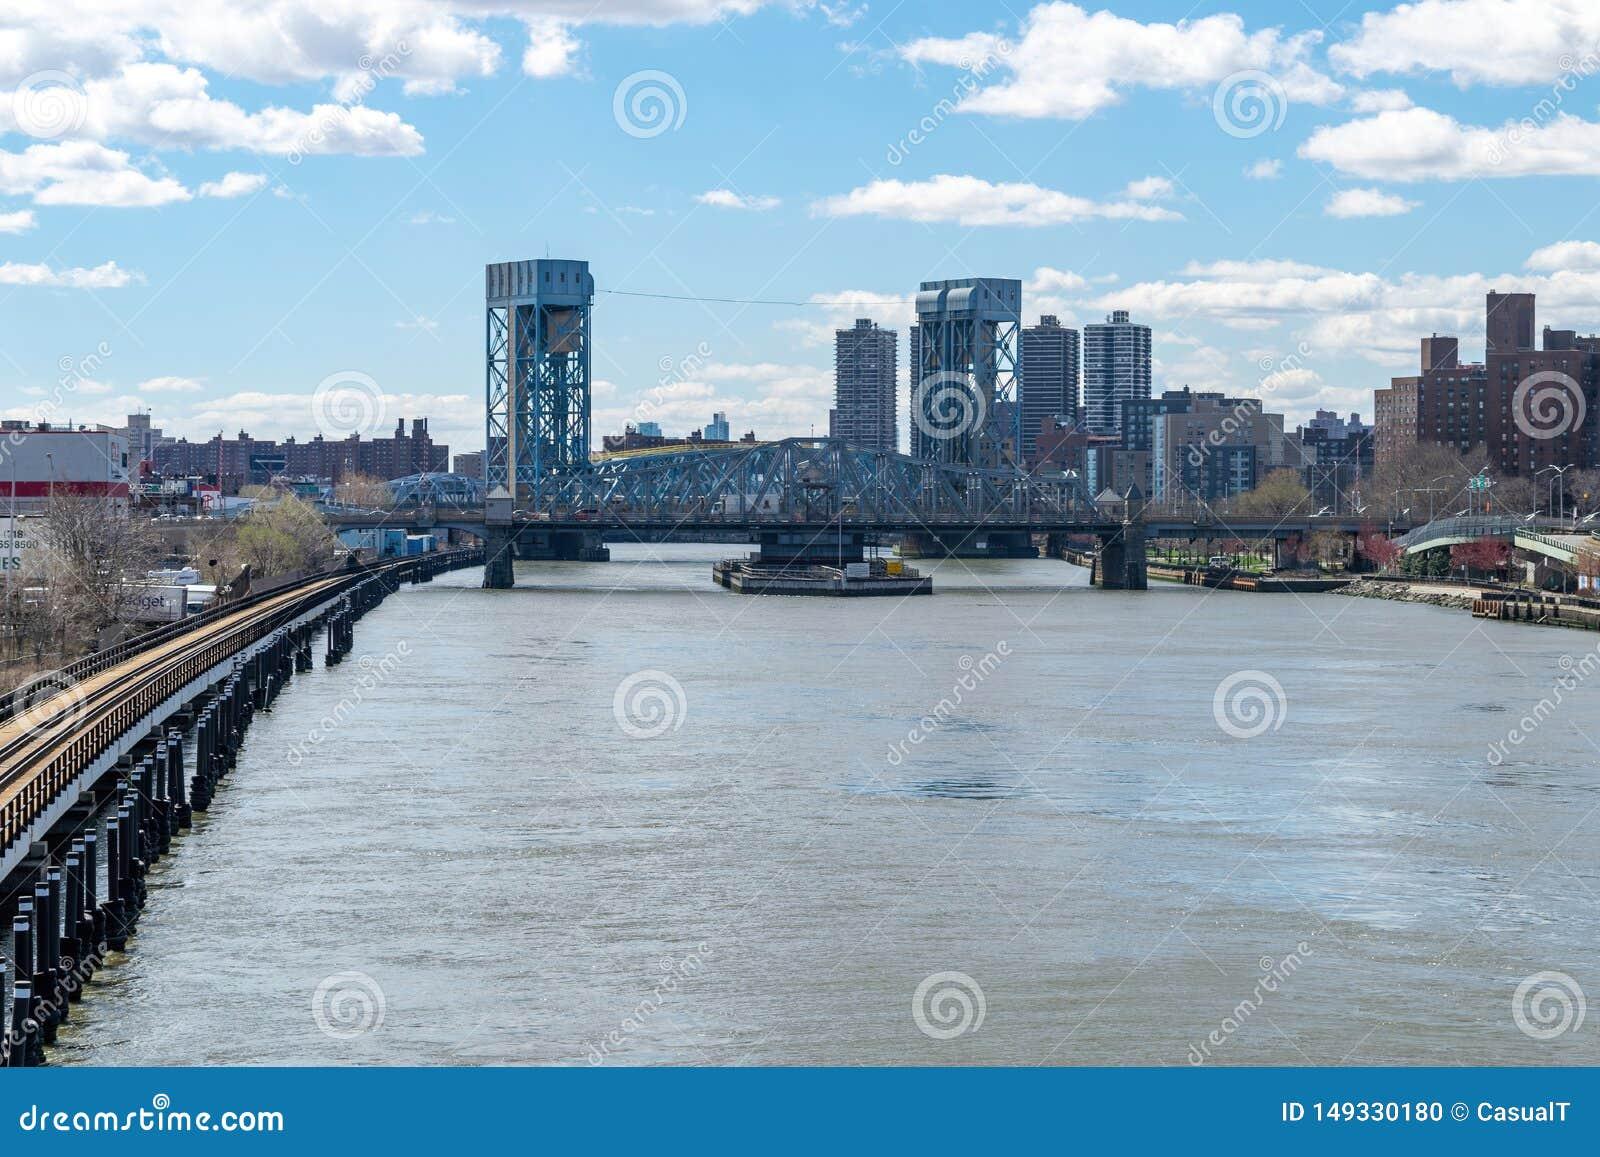 Entlang dem Harlem River Madison Avenue Bridge in Harlem, NYC, USA südlich betrachten